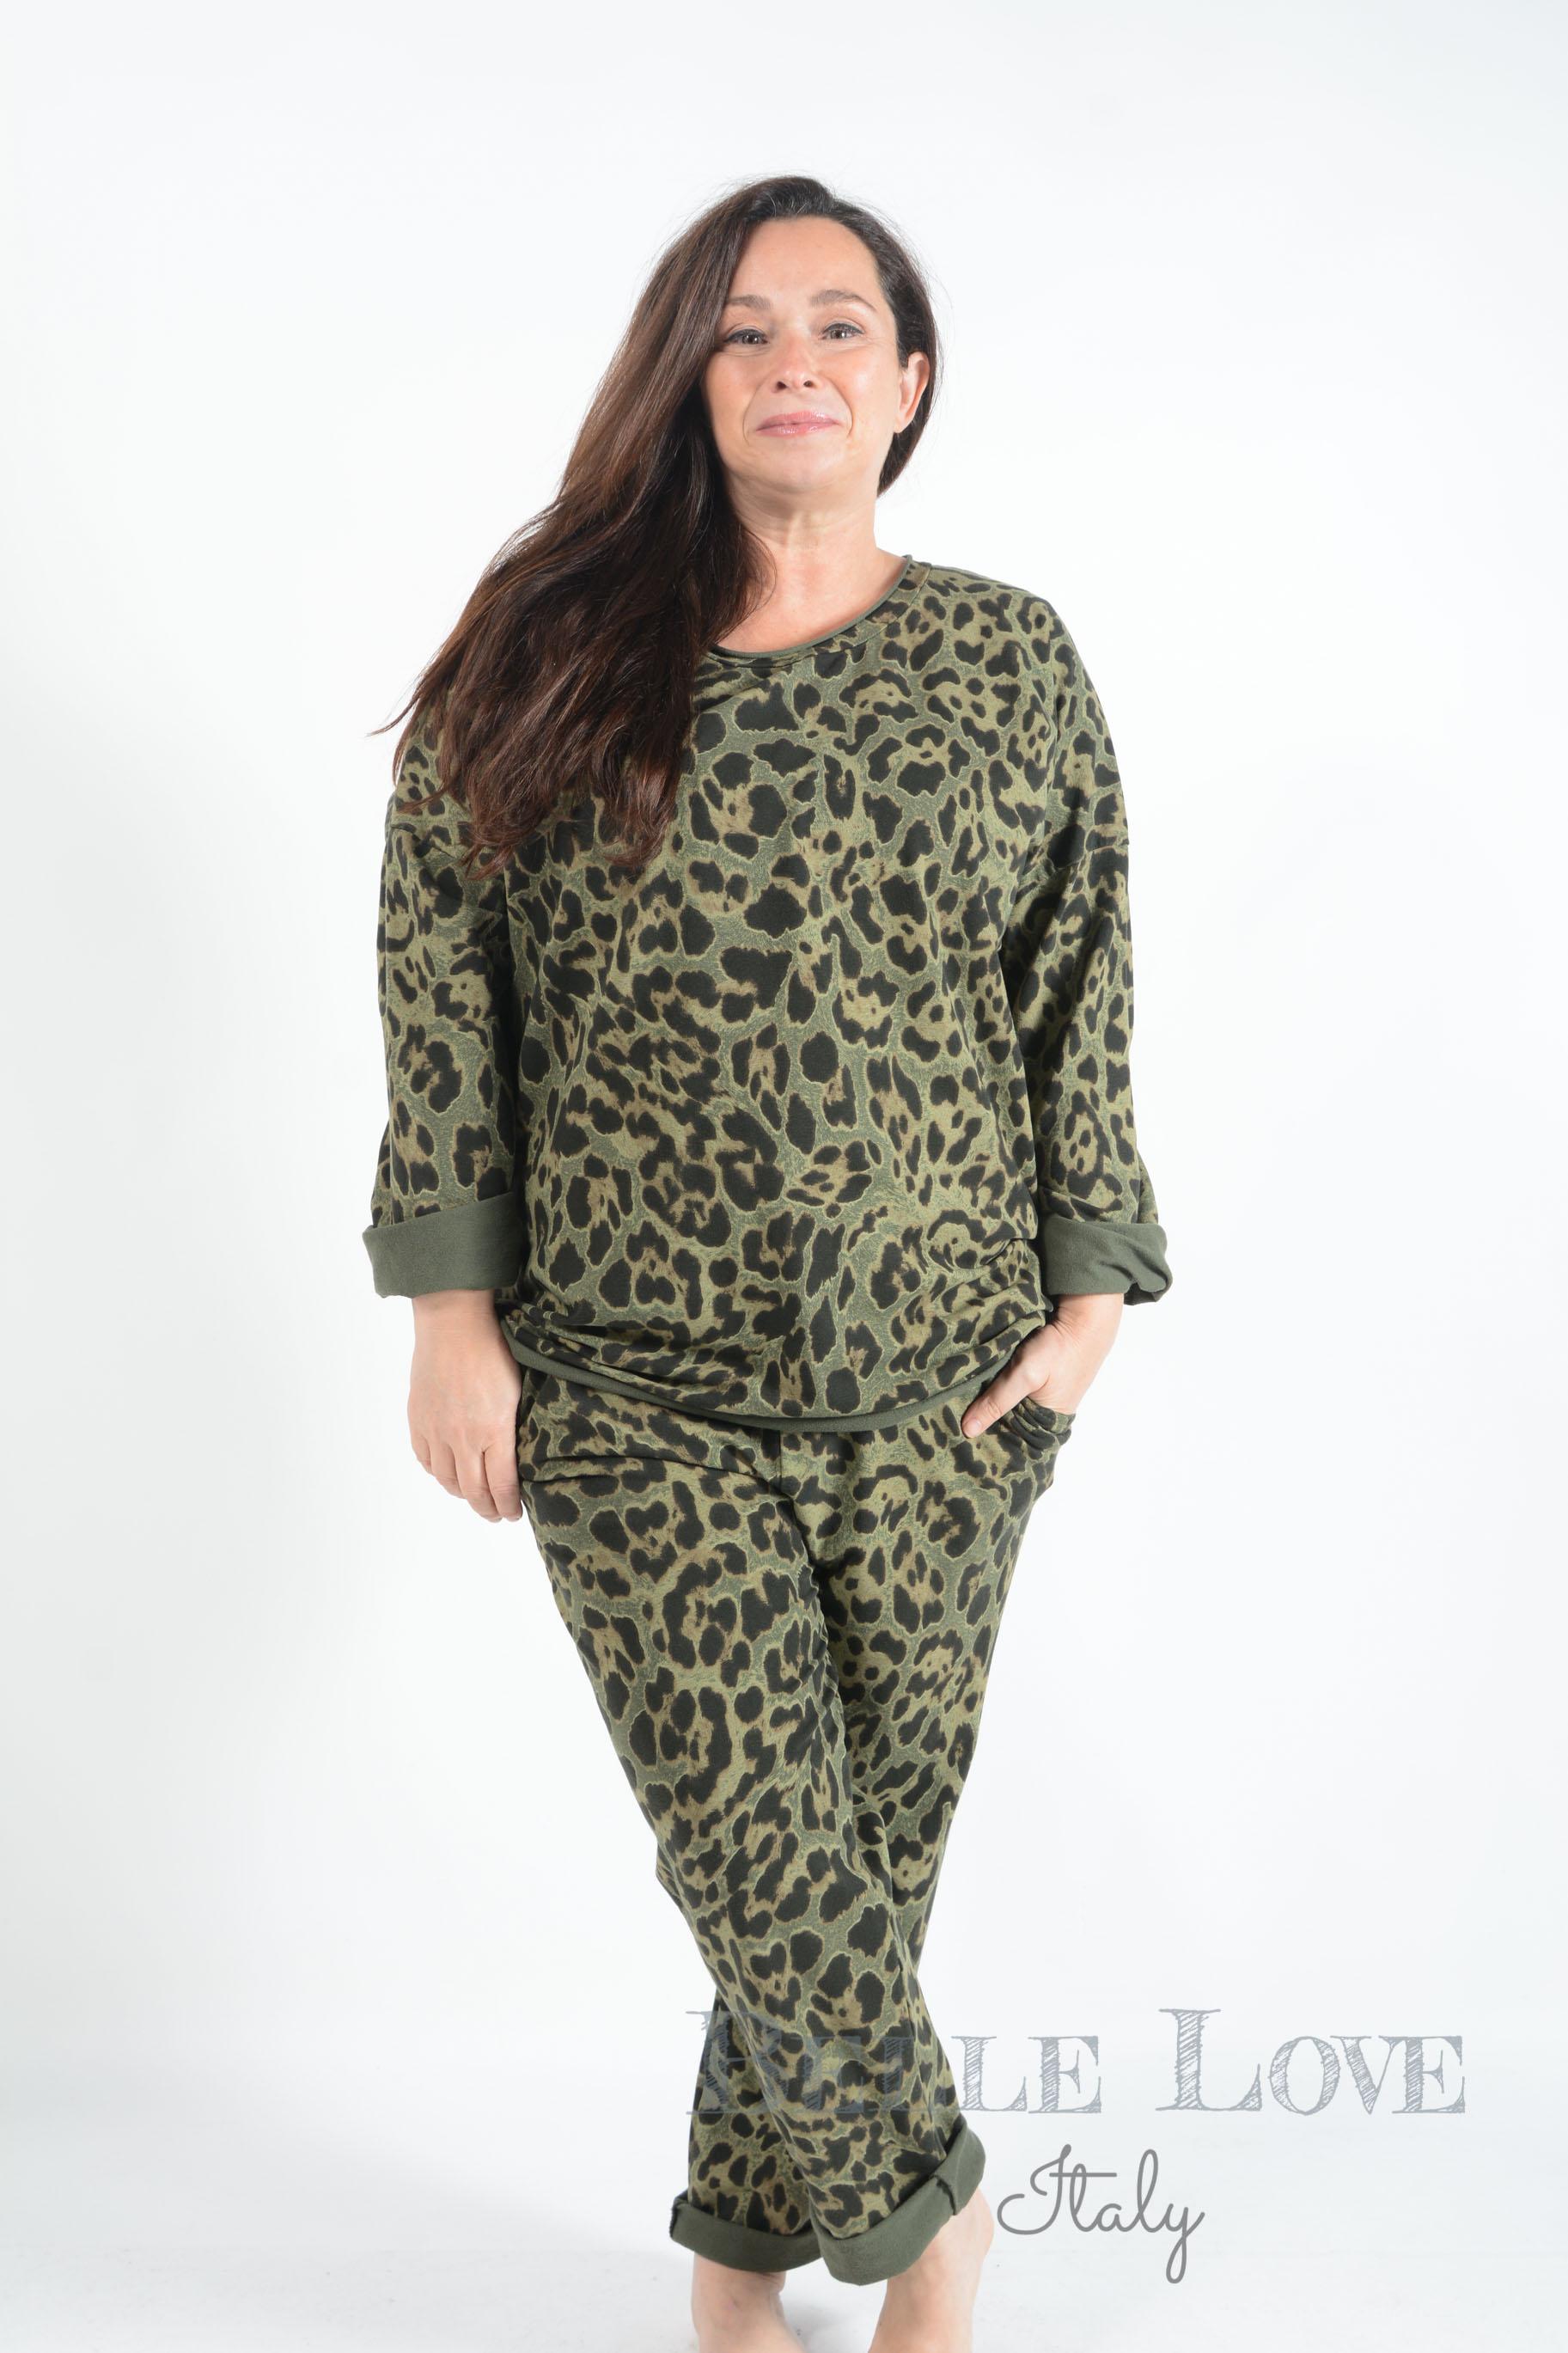 Belle Love Italy Animal Print Loungewear Set